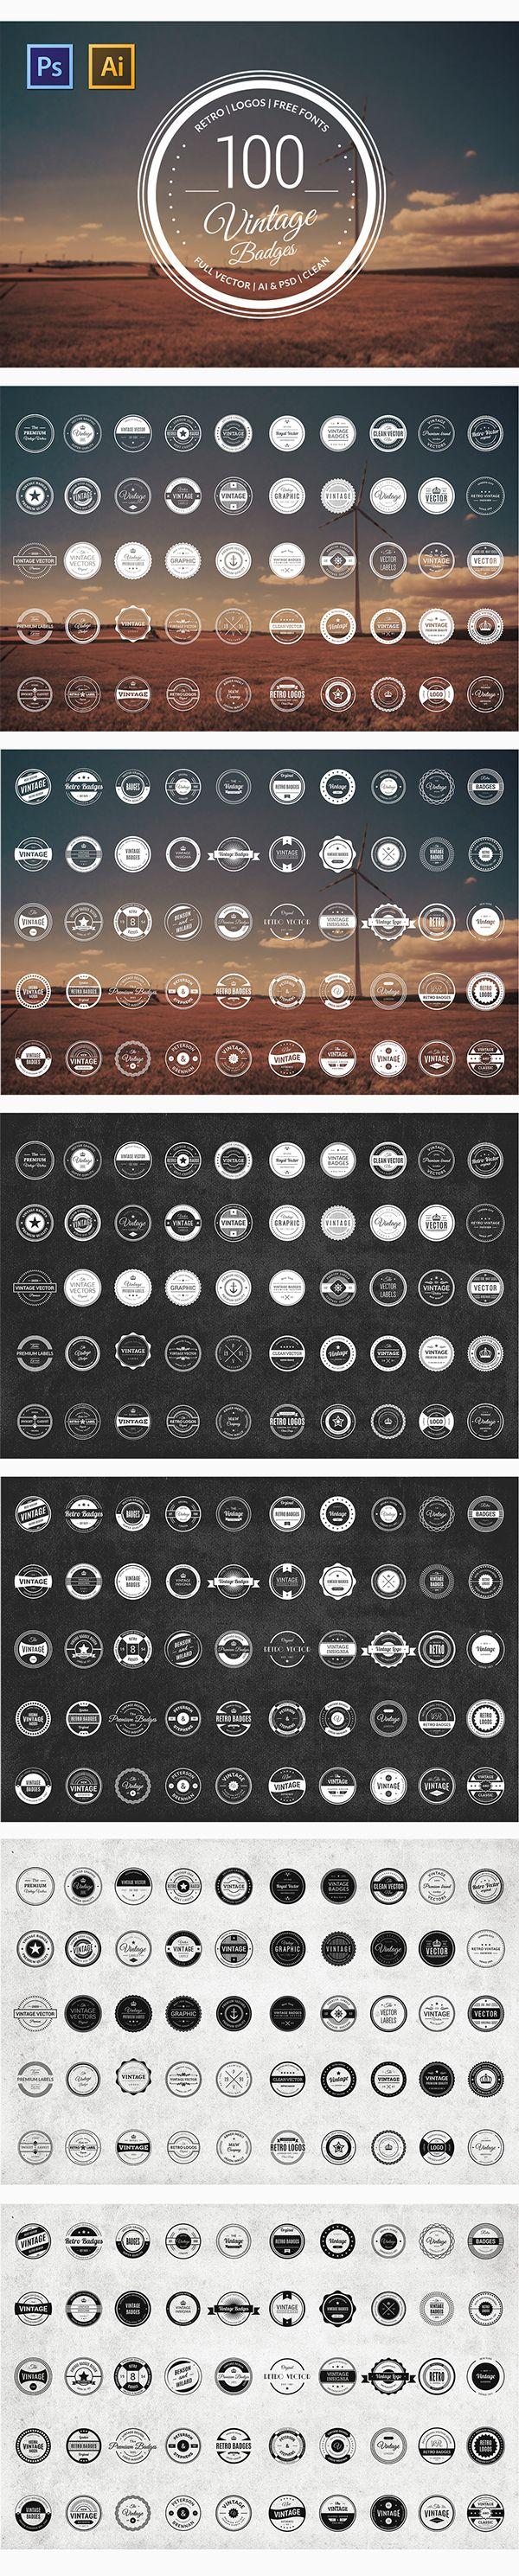 100 Retro Badge Templates on Behance